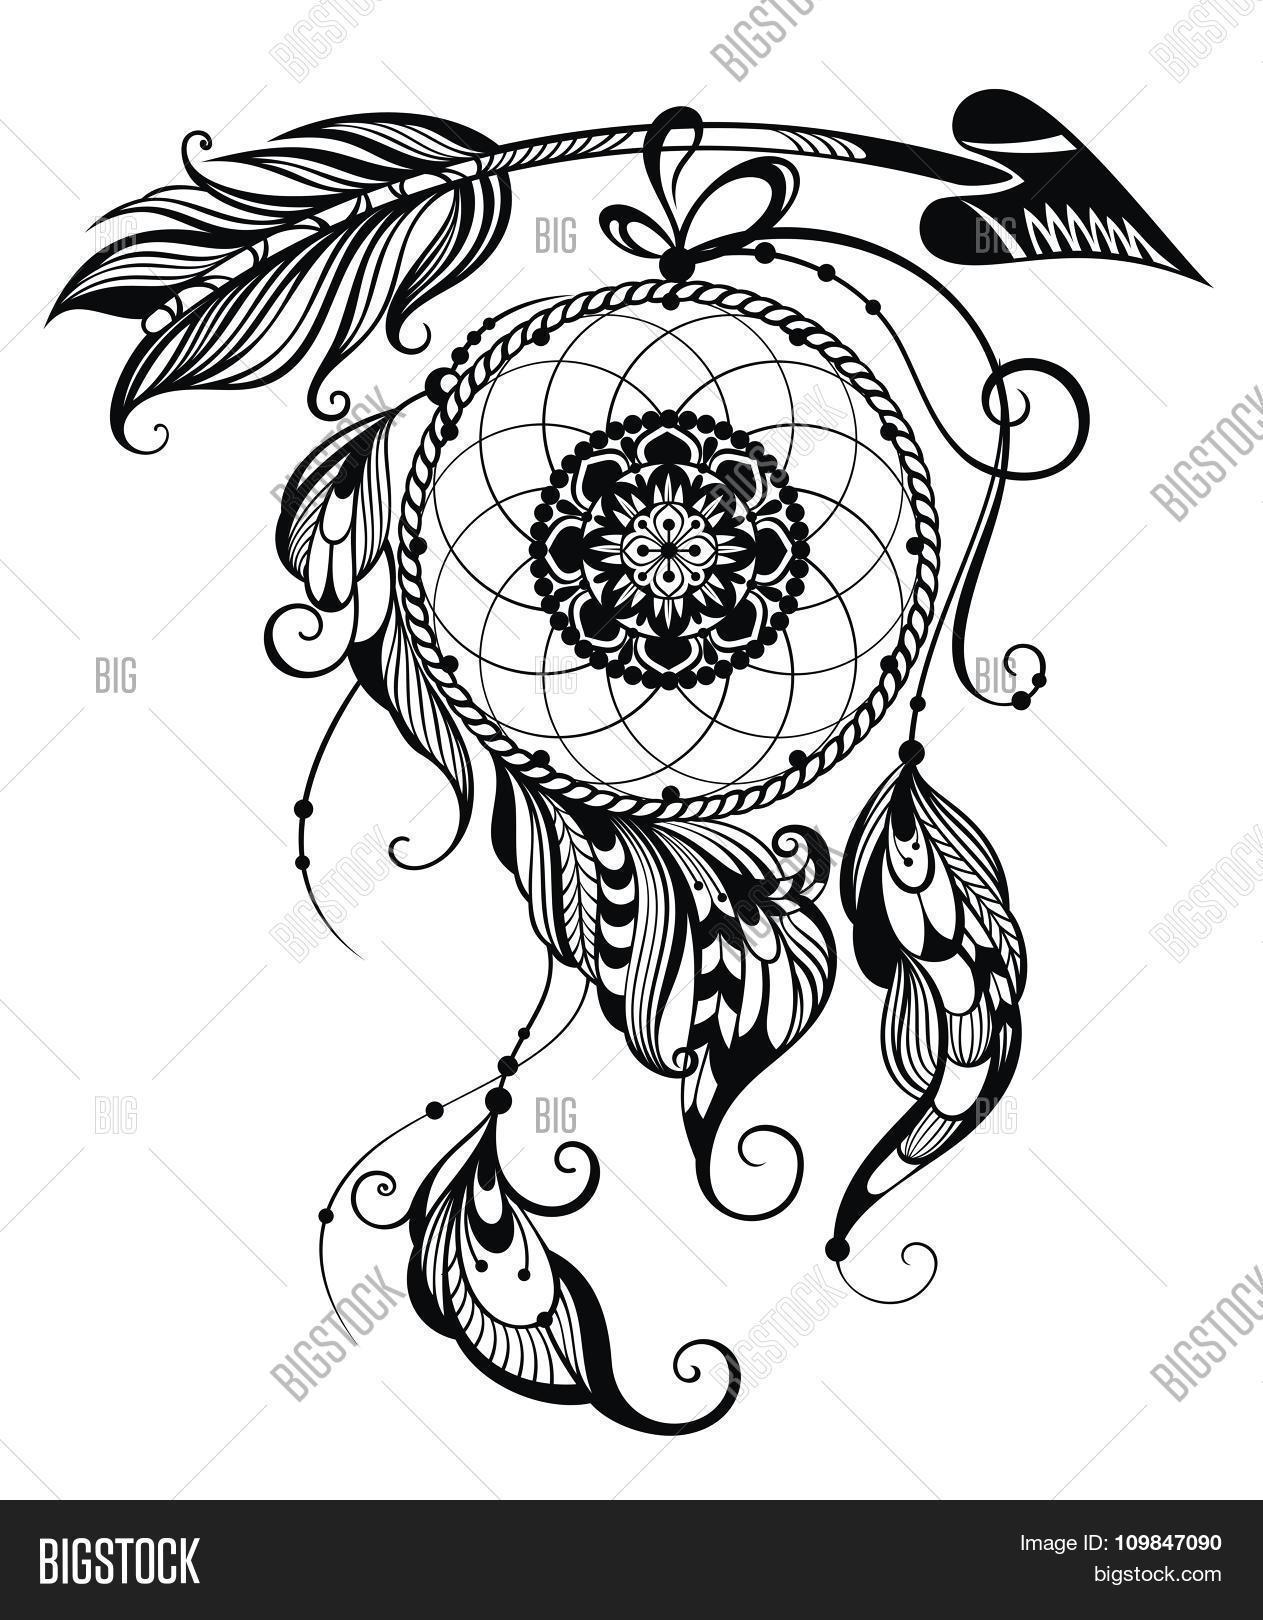 1263x1620 Dream Catcher Images, Illustrations, Vectors